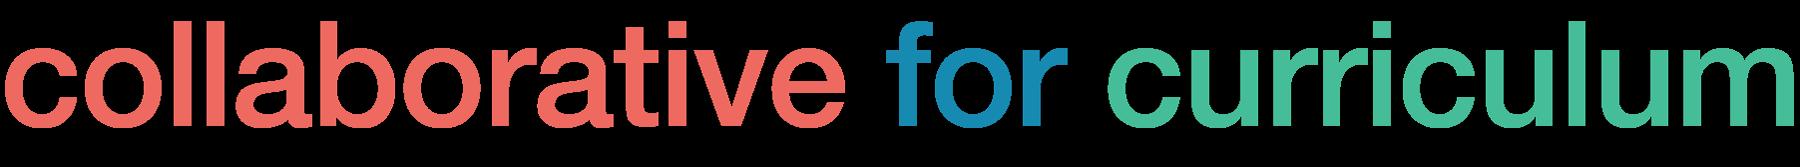 Collaborative For Curriculum Logo